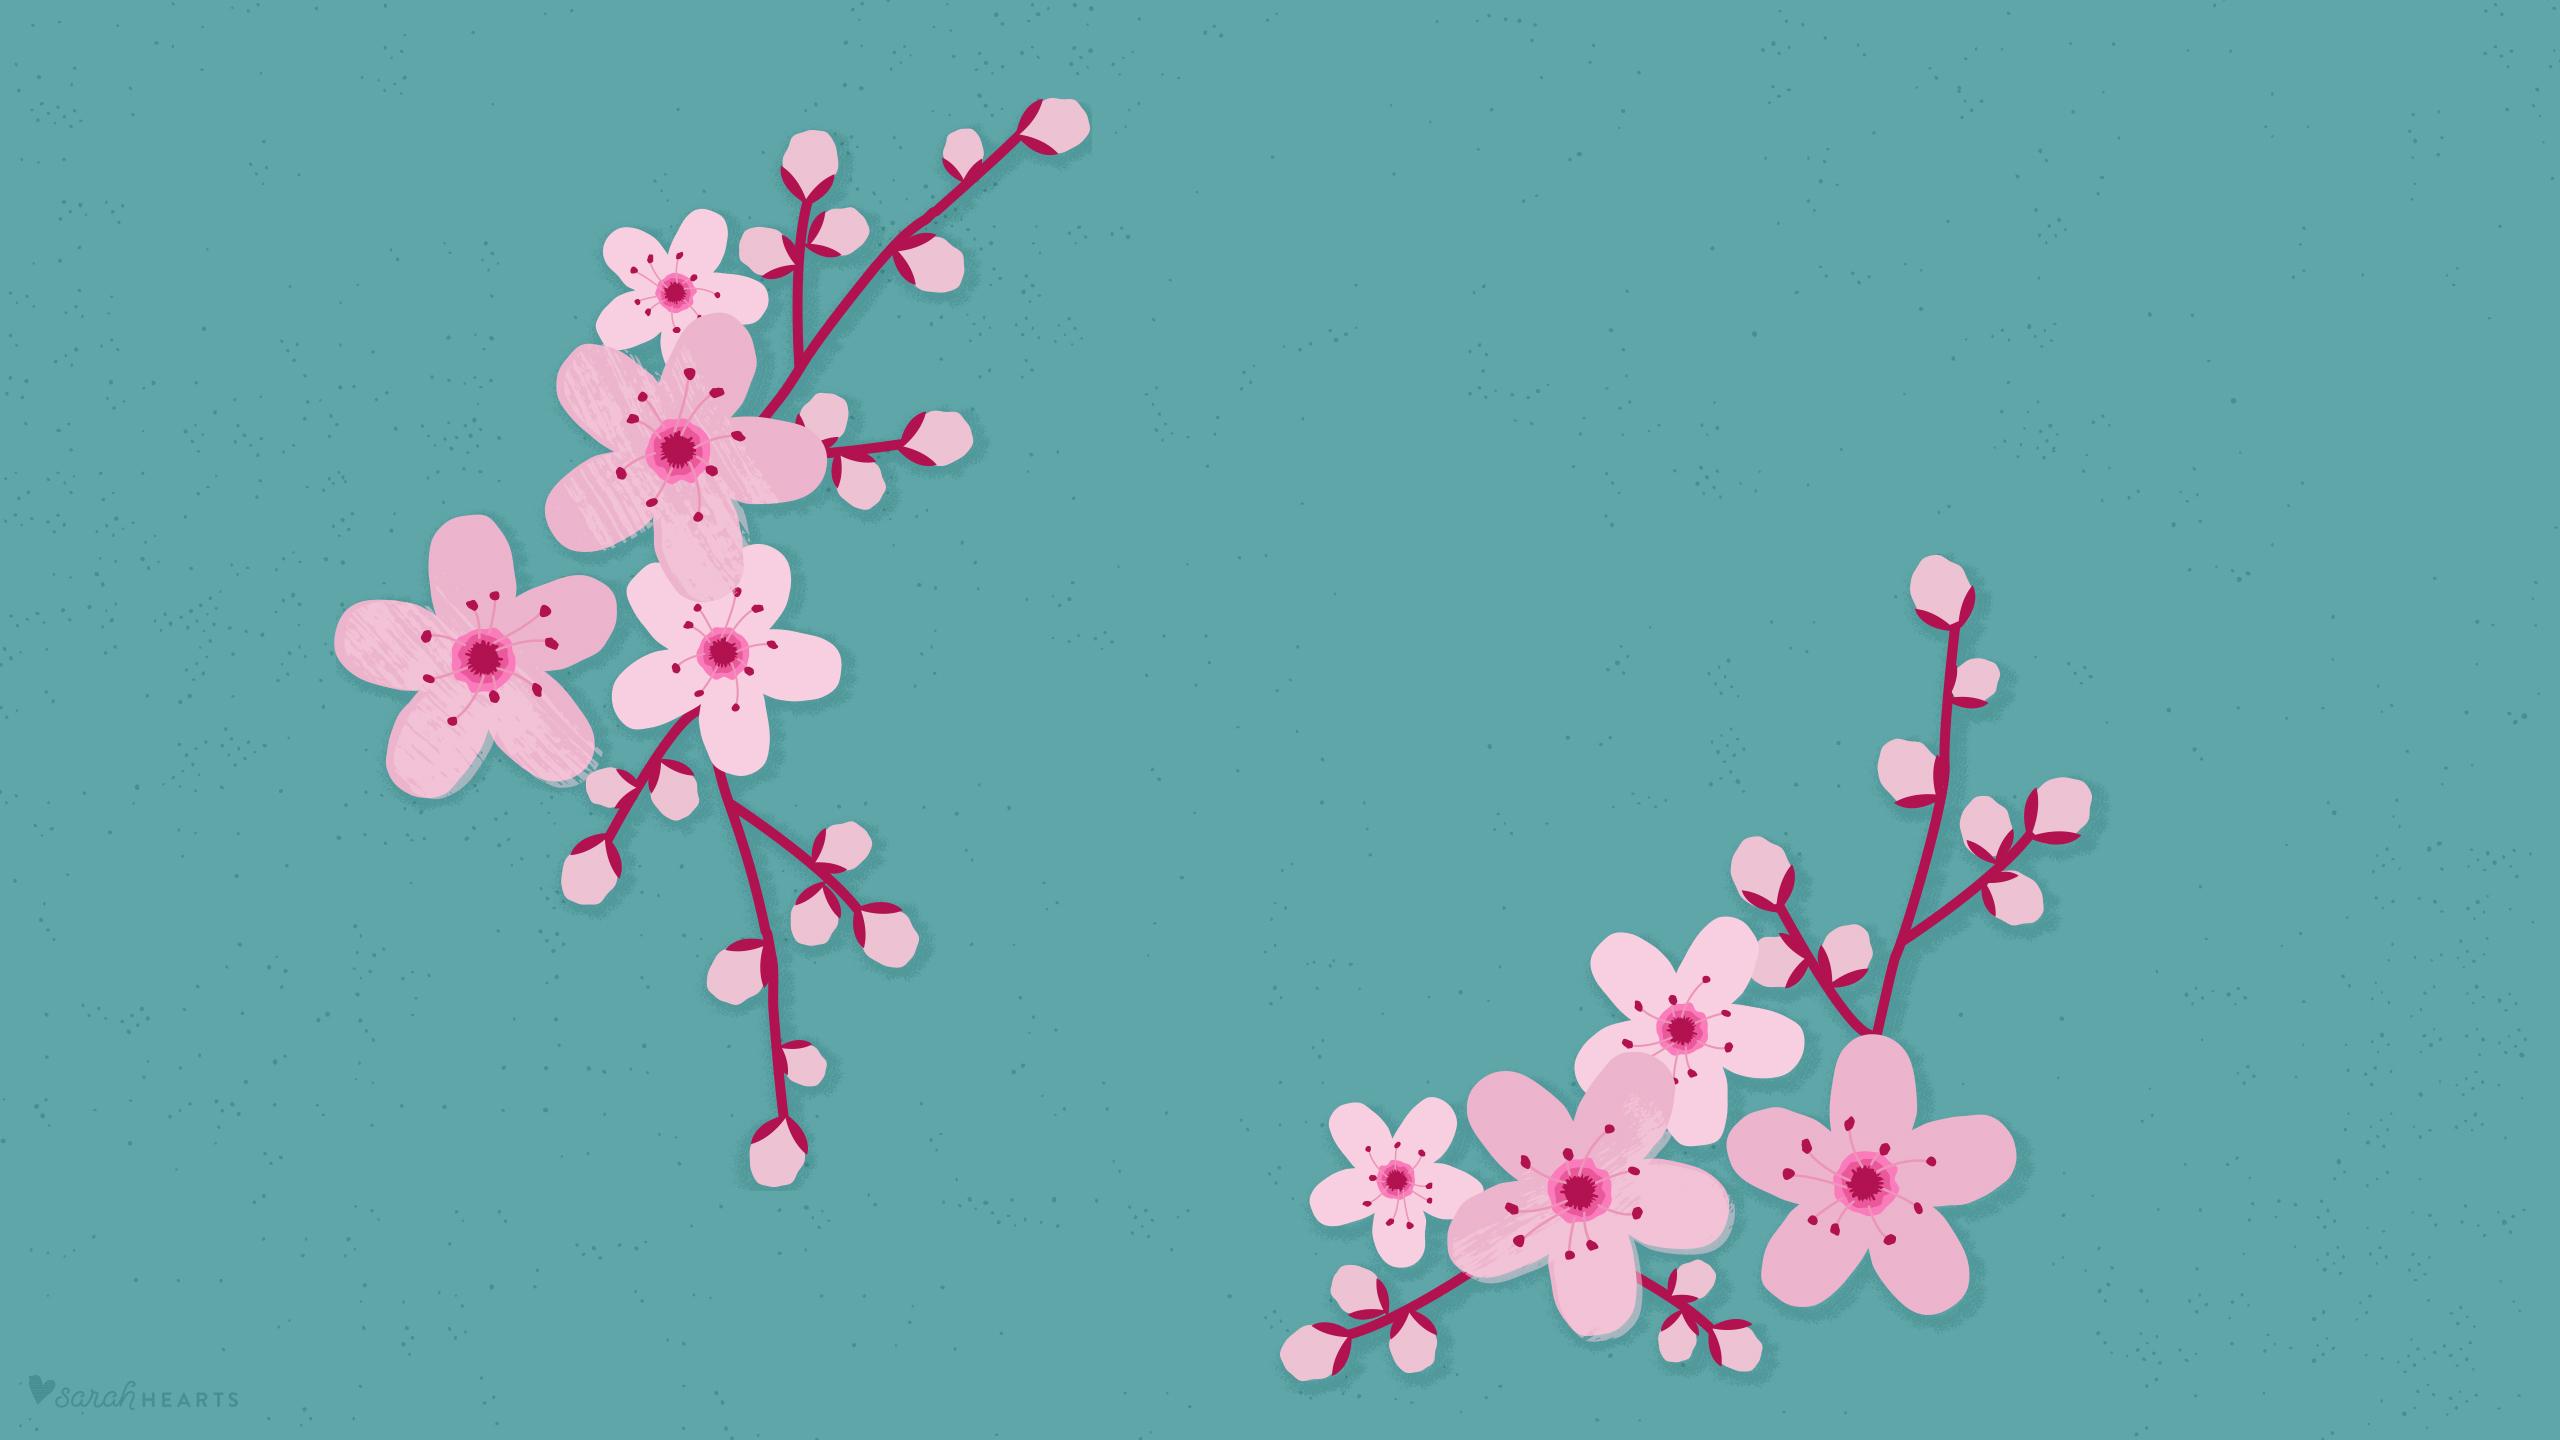 March 2016 Cherry Blossom Calendar Wallpaper - Sarah Hearts